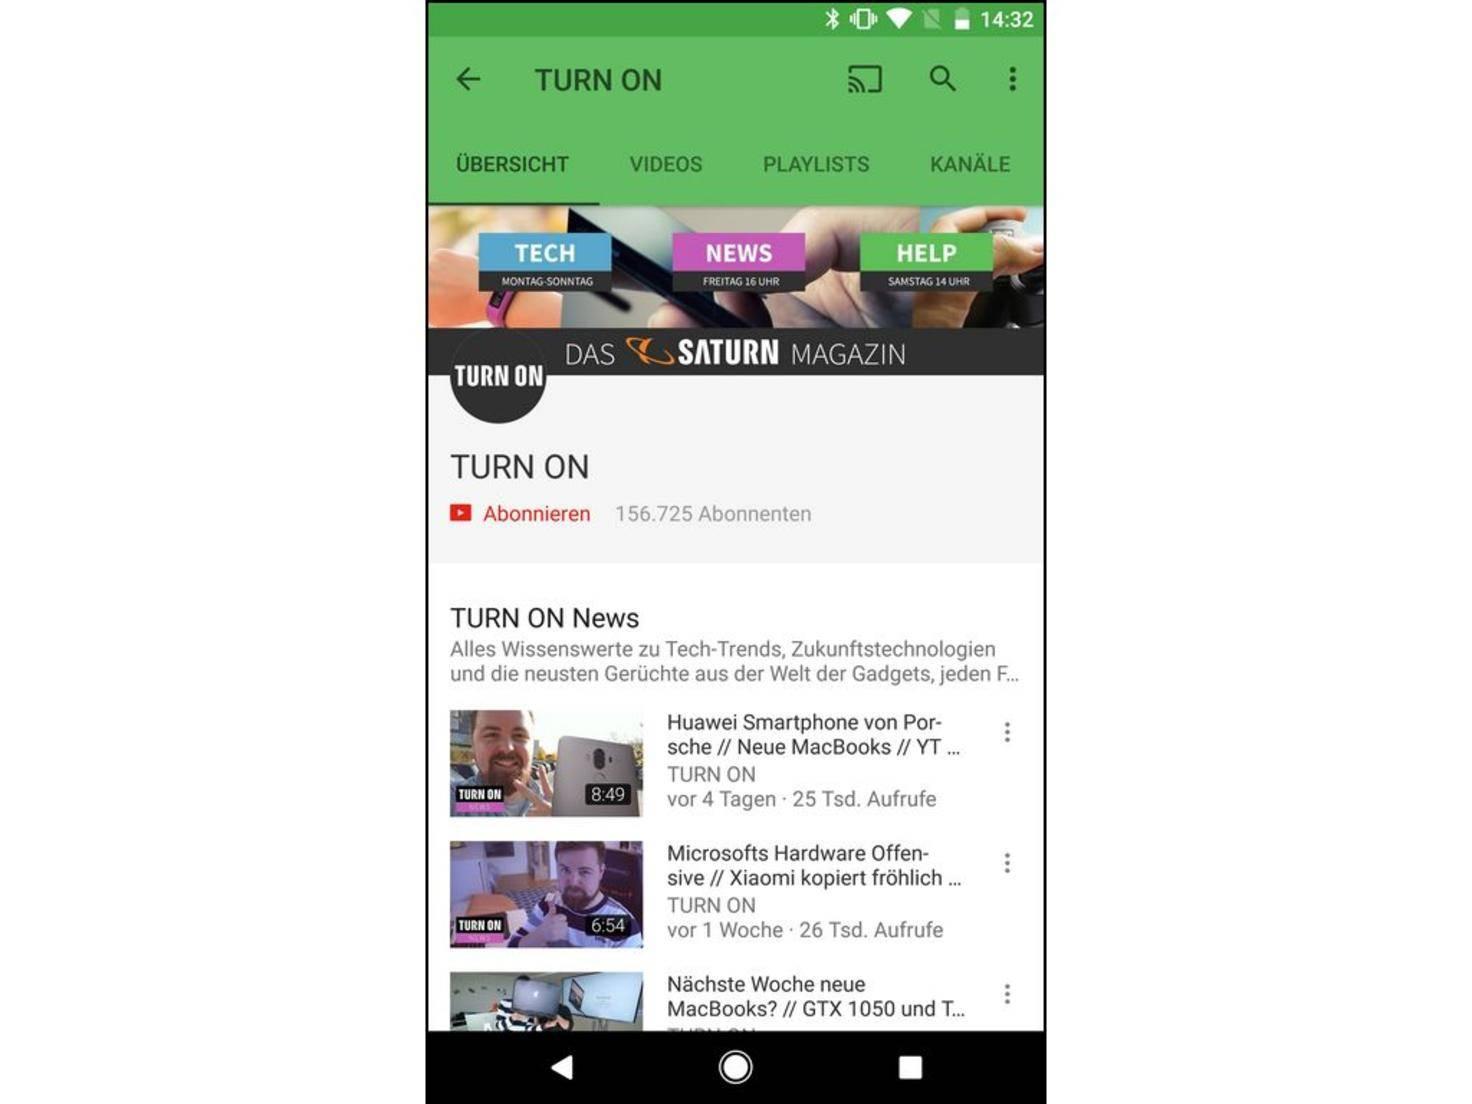 YouTube TURN ON